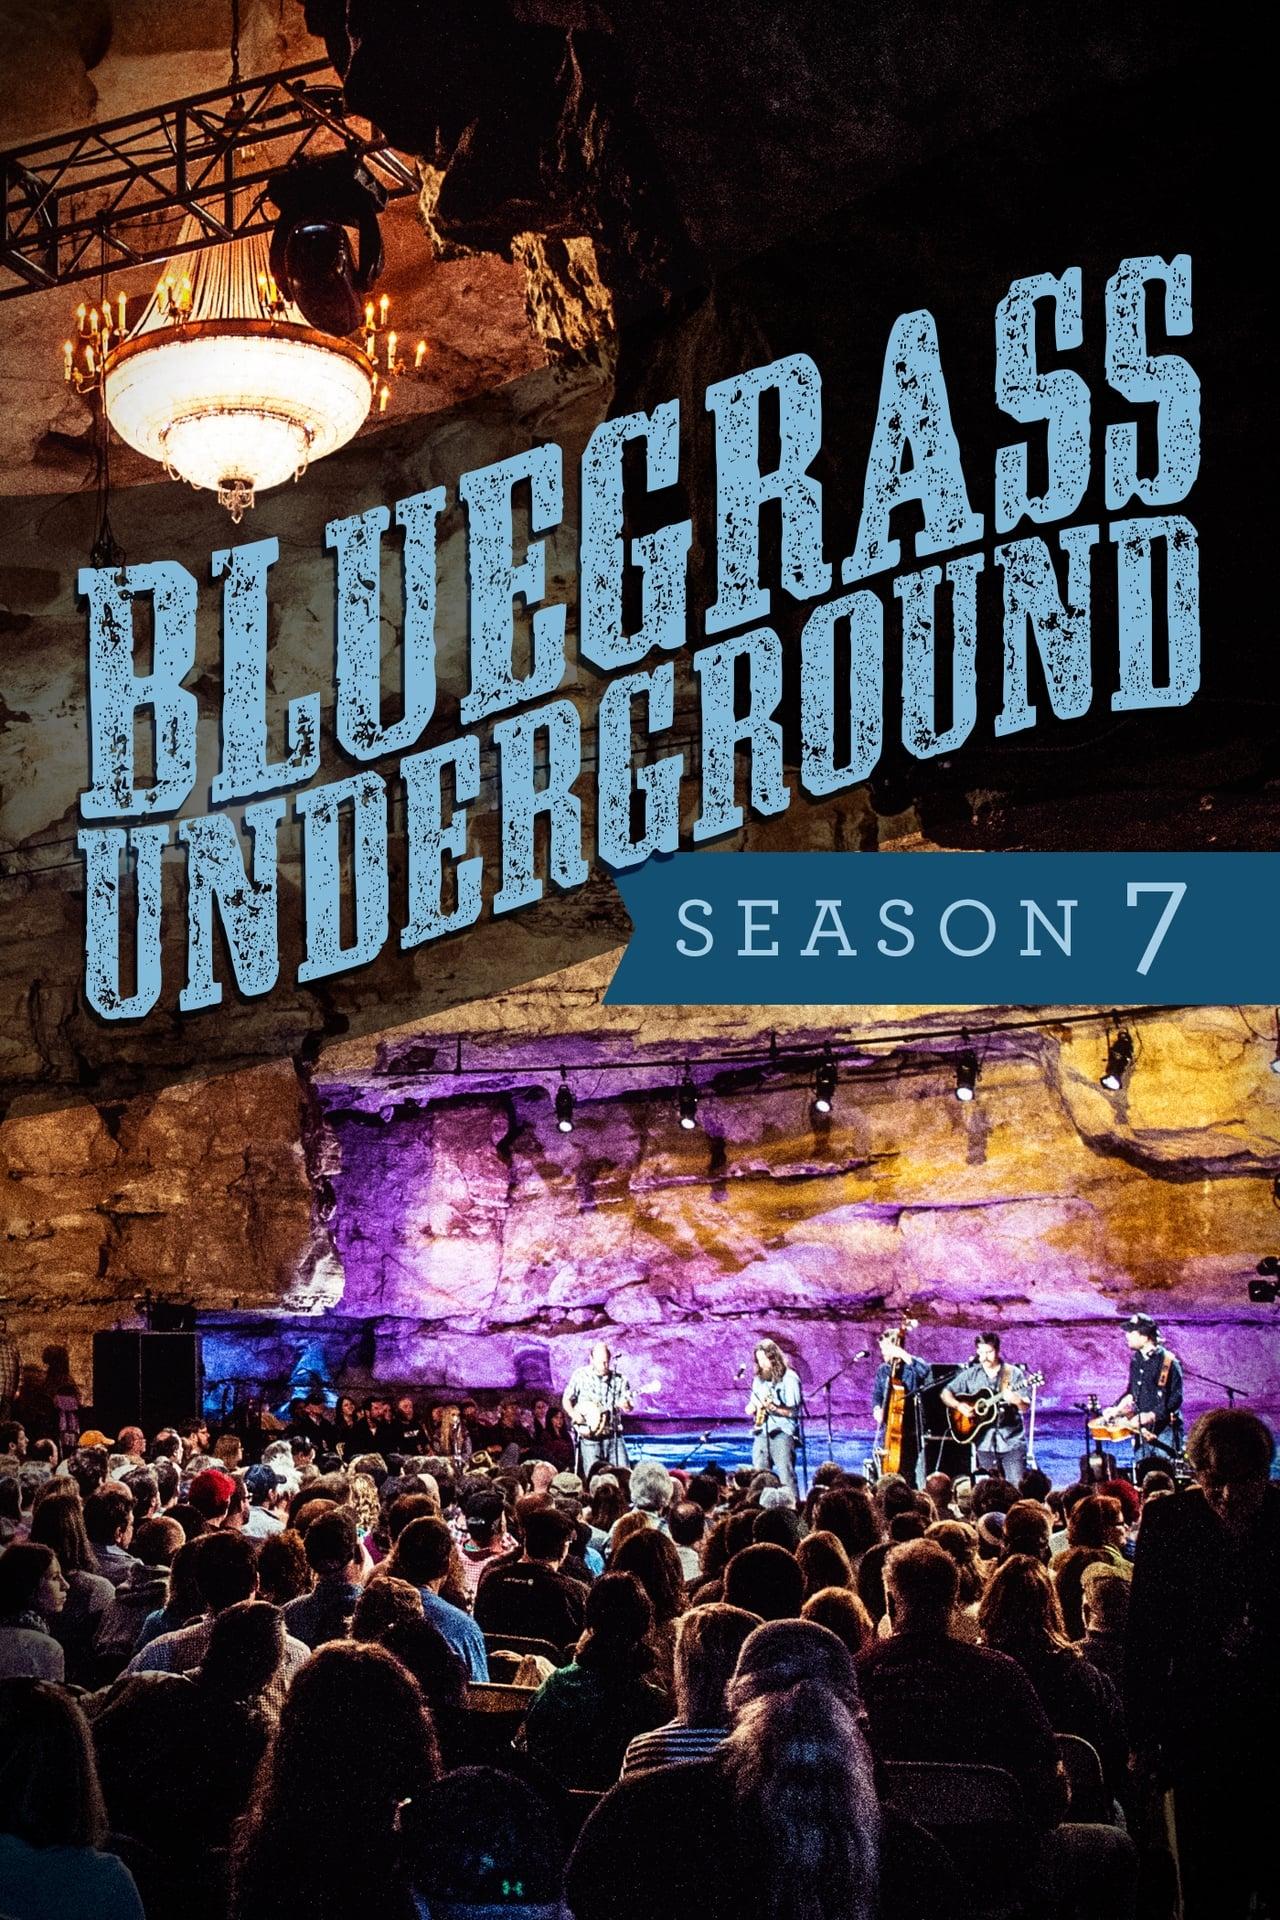 Bluegrass Underground Season 7 (2017) putlockers cafe